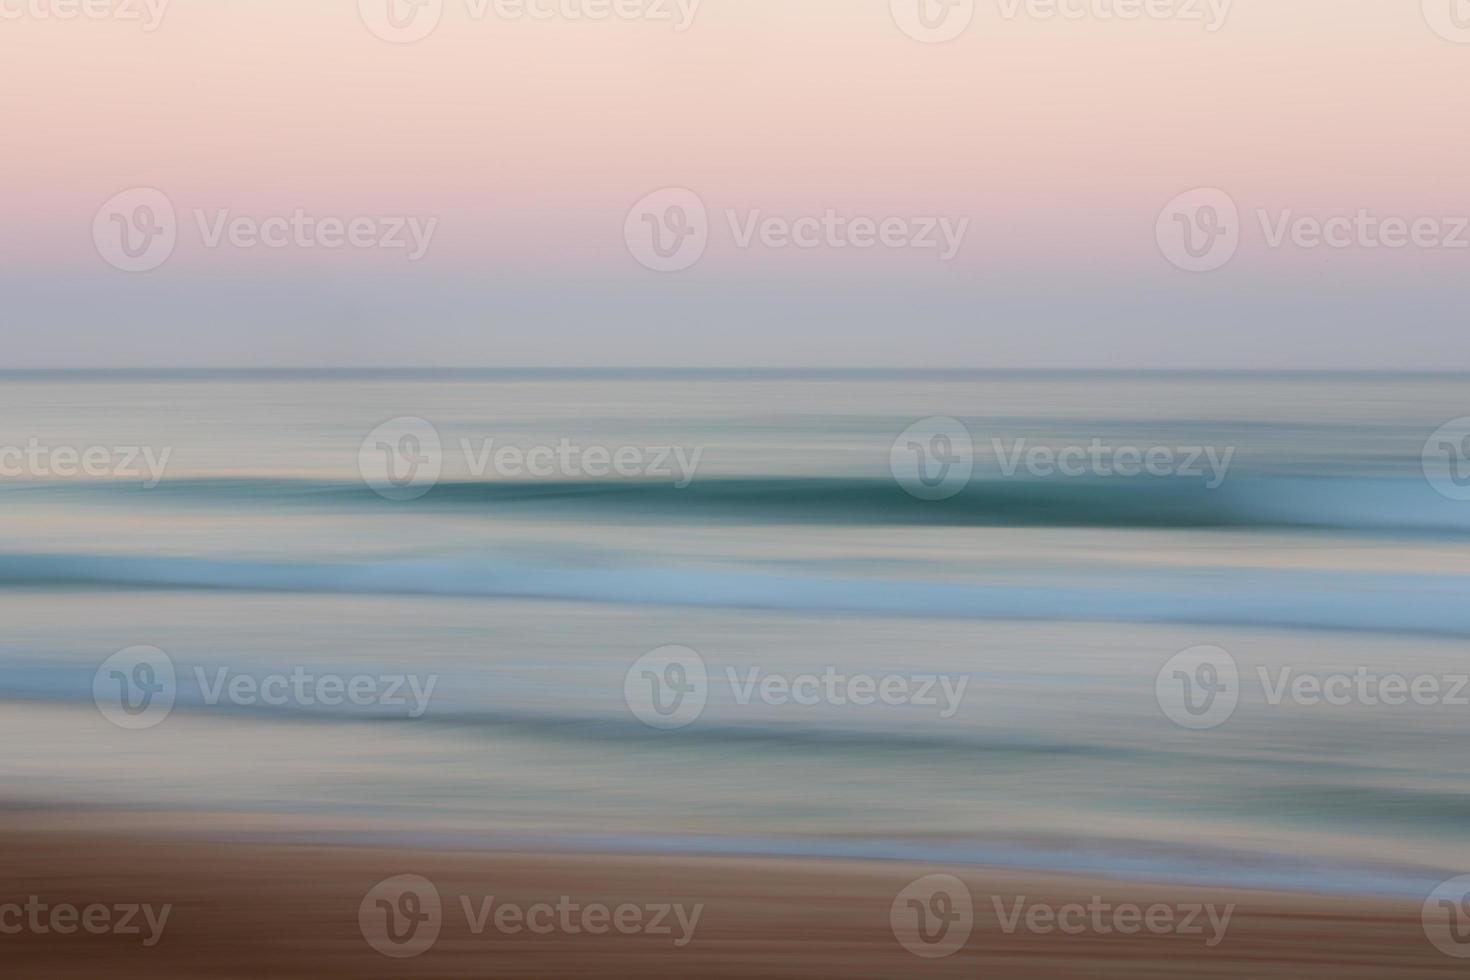 abstracte zonsopgang oceaanachtergrond met vage panning-beweging foto